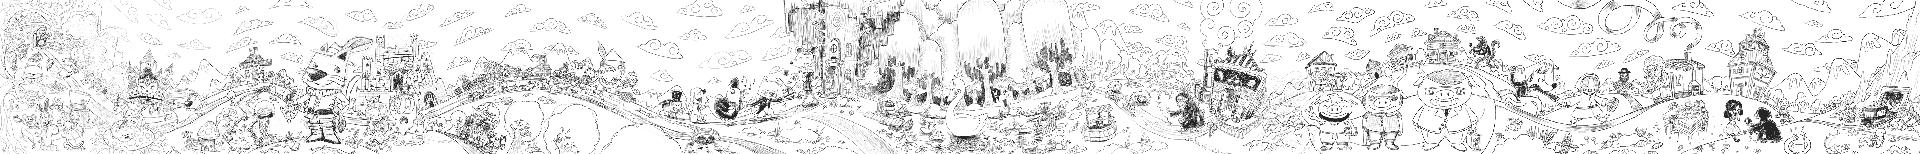 Panoramic digital sketch drawing of Wondertales form Neverland